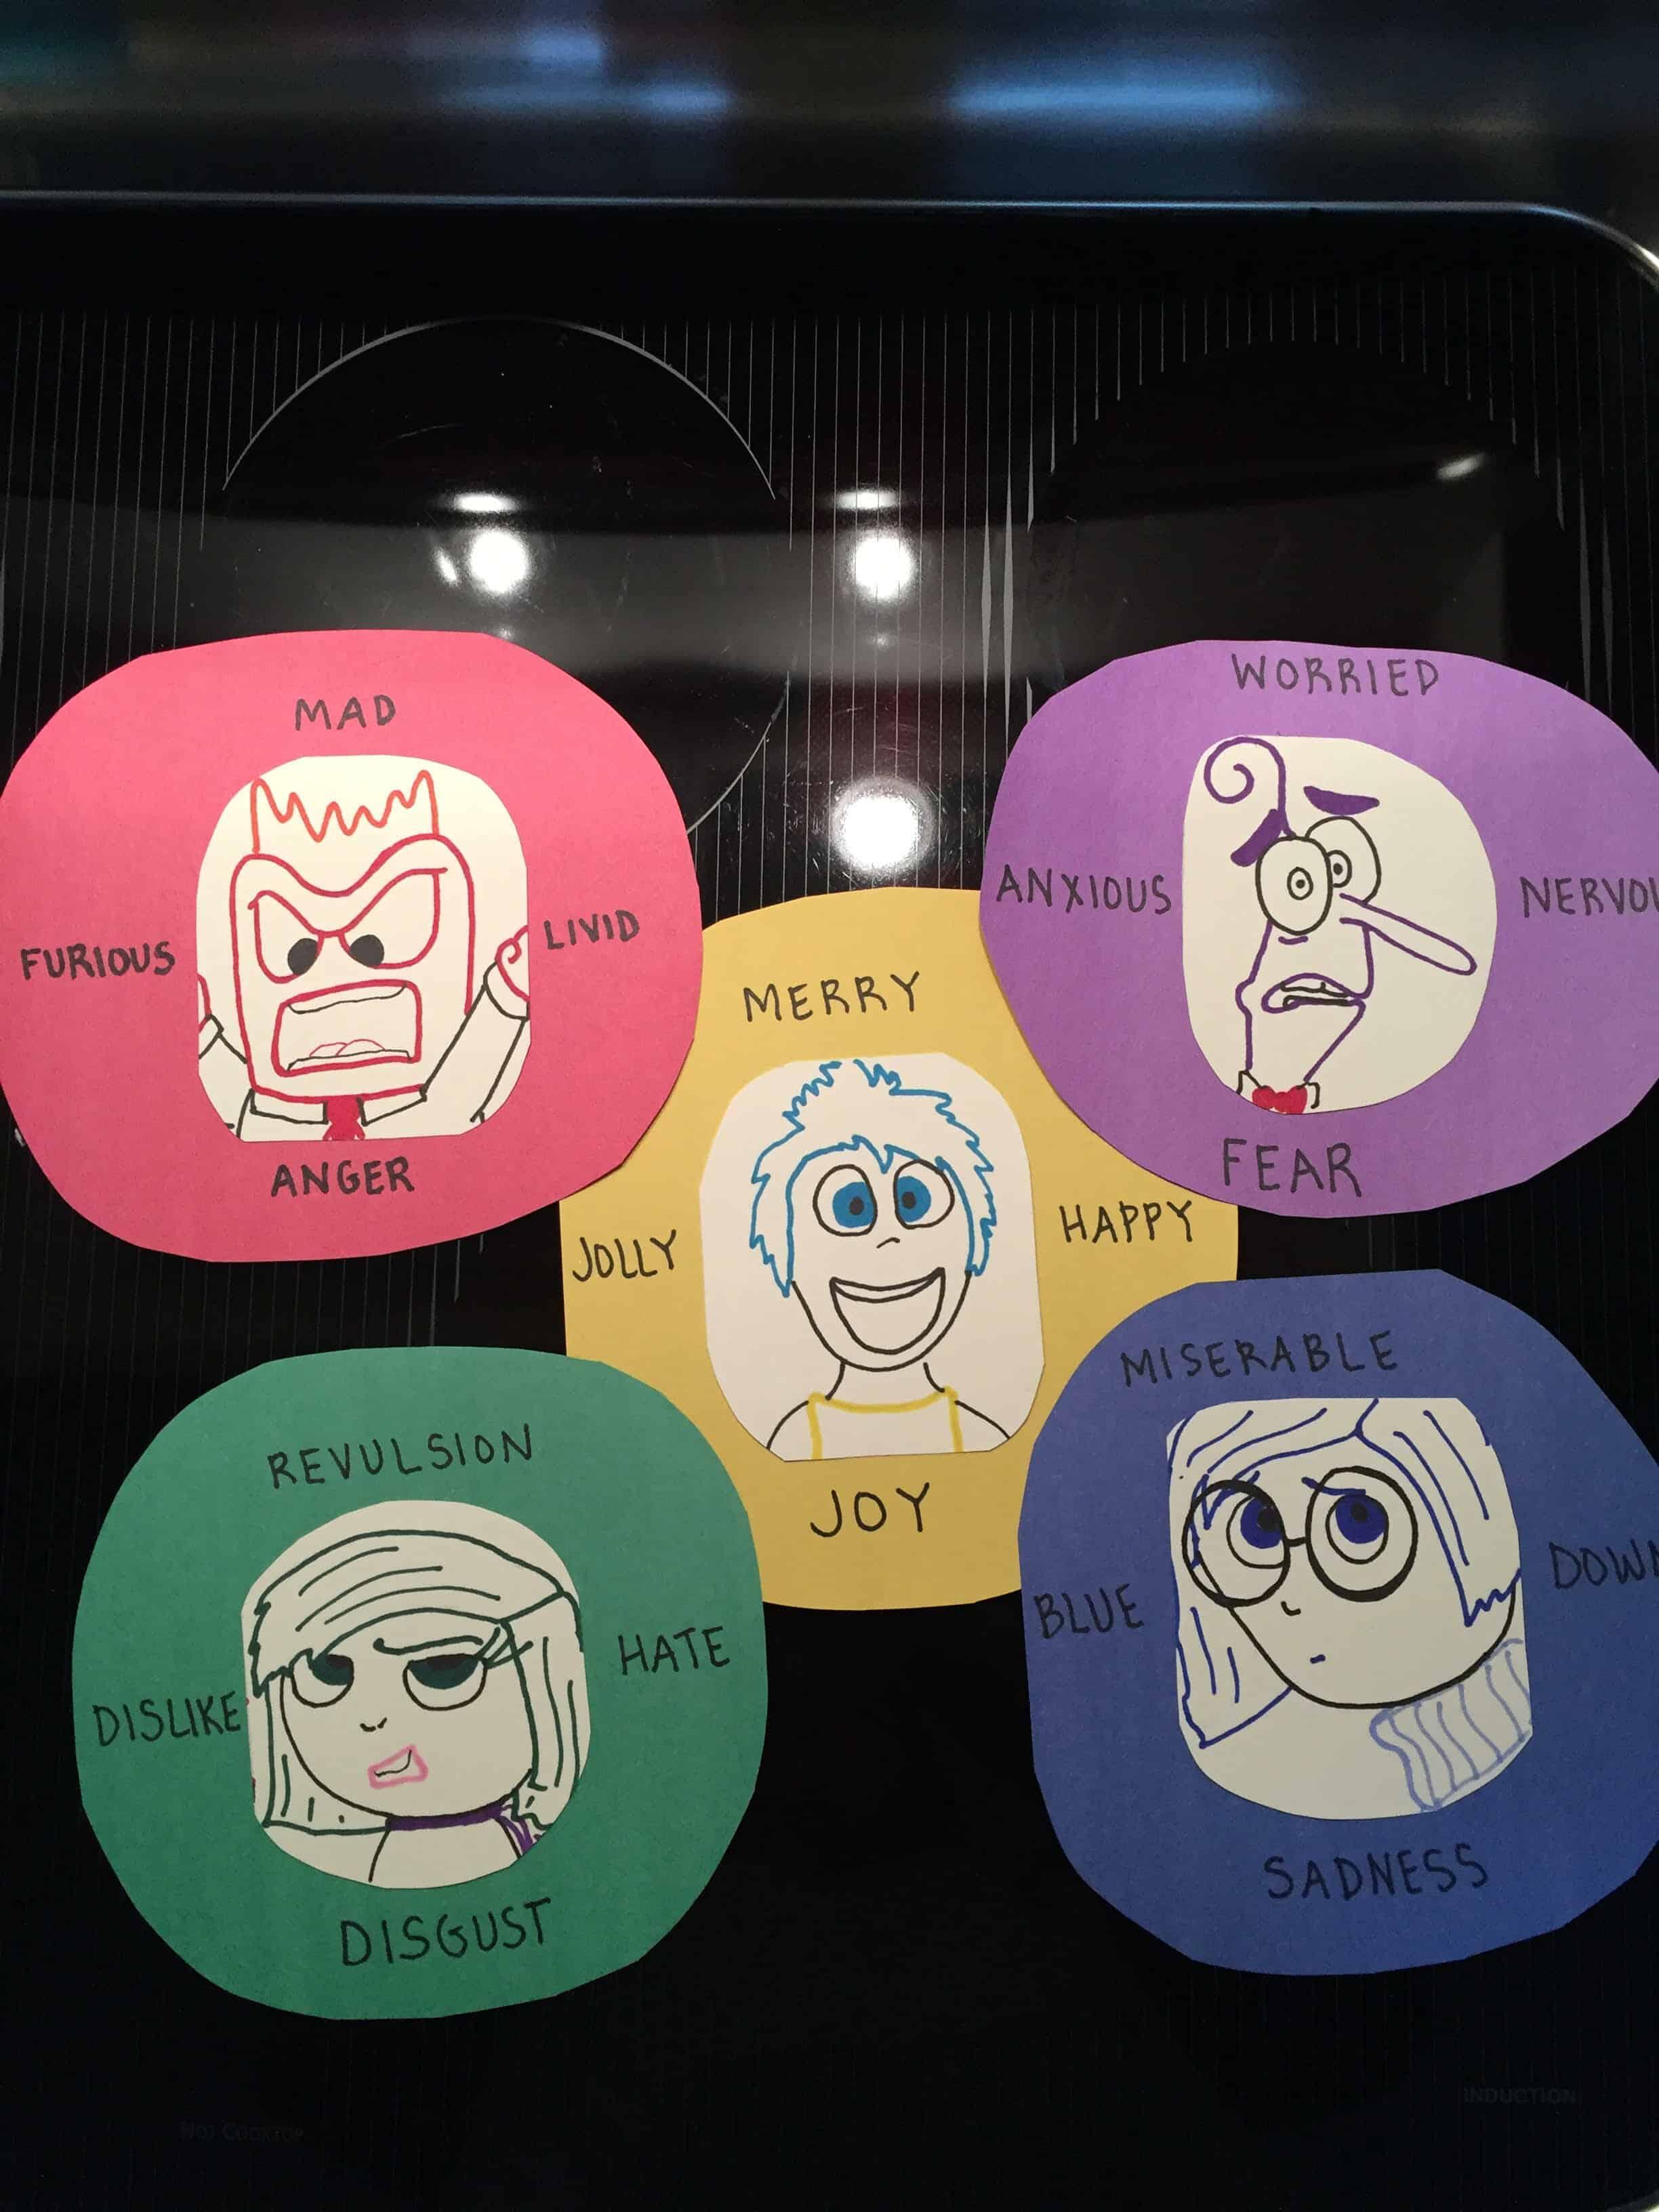 7 Tips to Help Children Identify Feelings {Plus a DIY